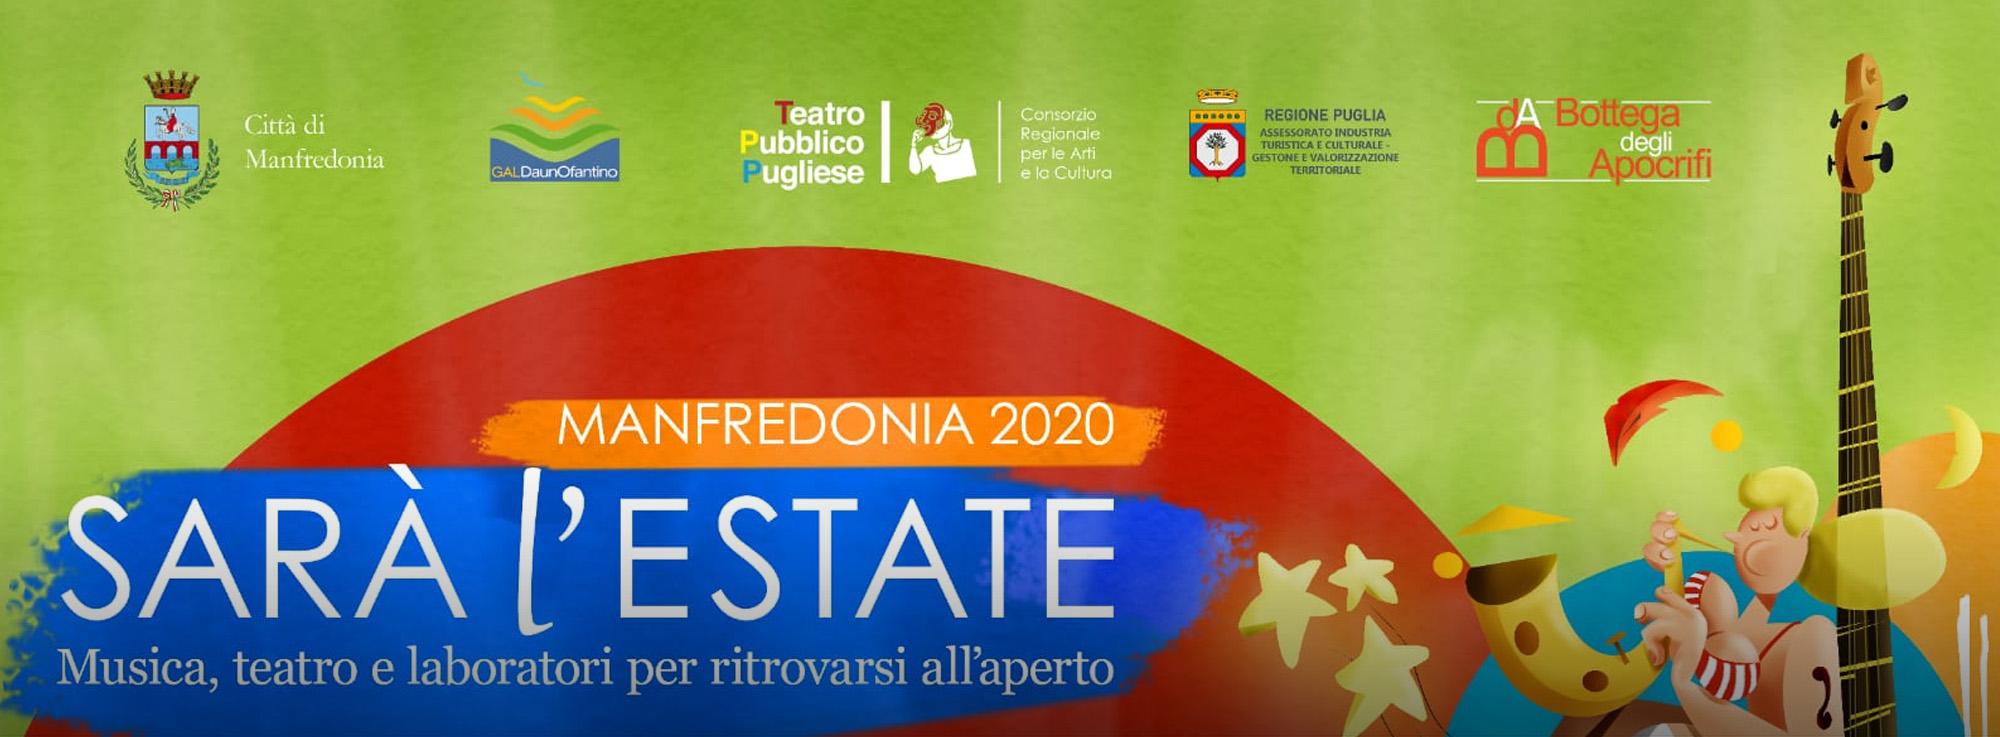 Manfredonia: Sarà l'Estate